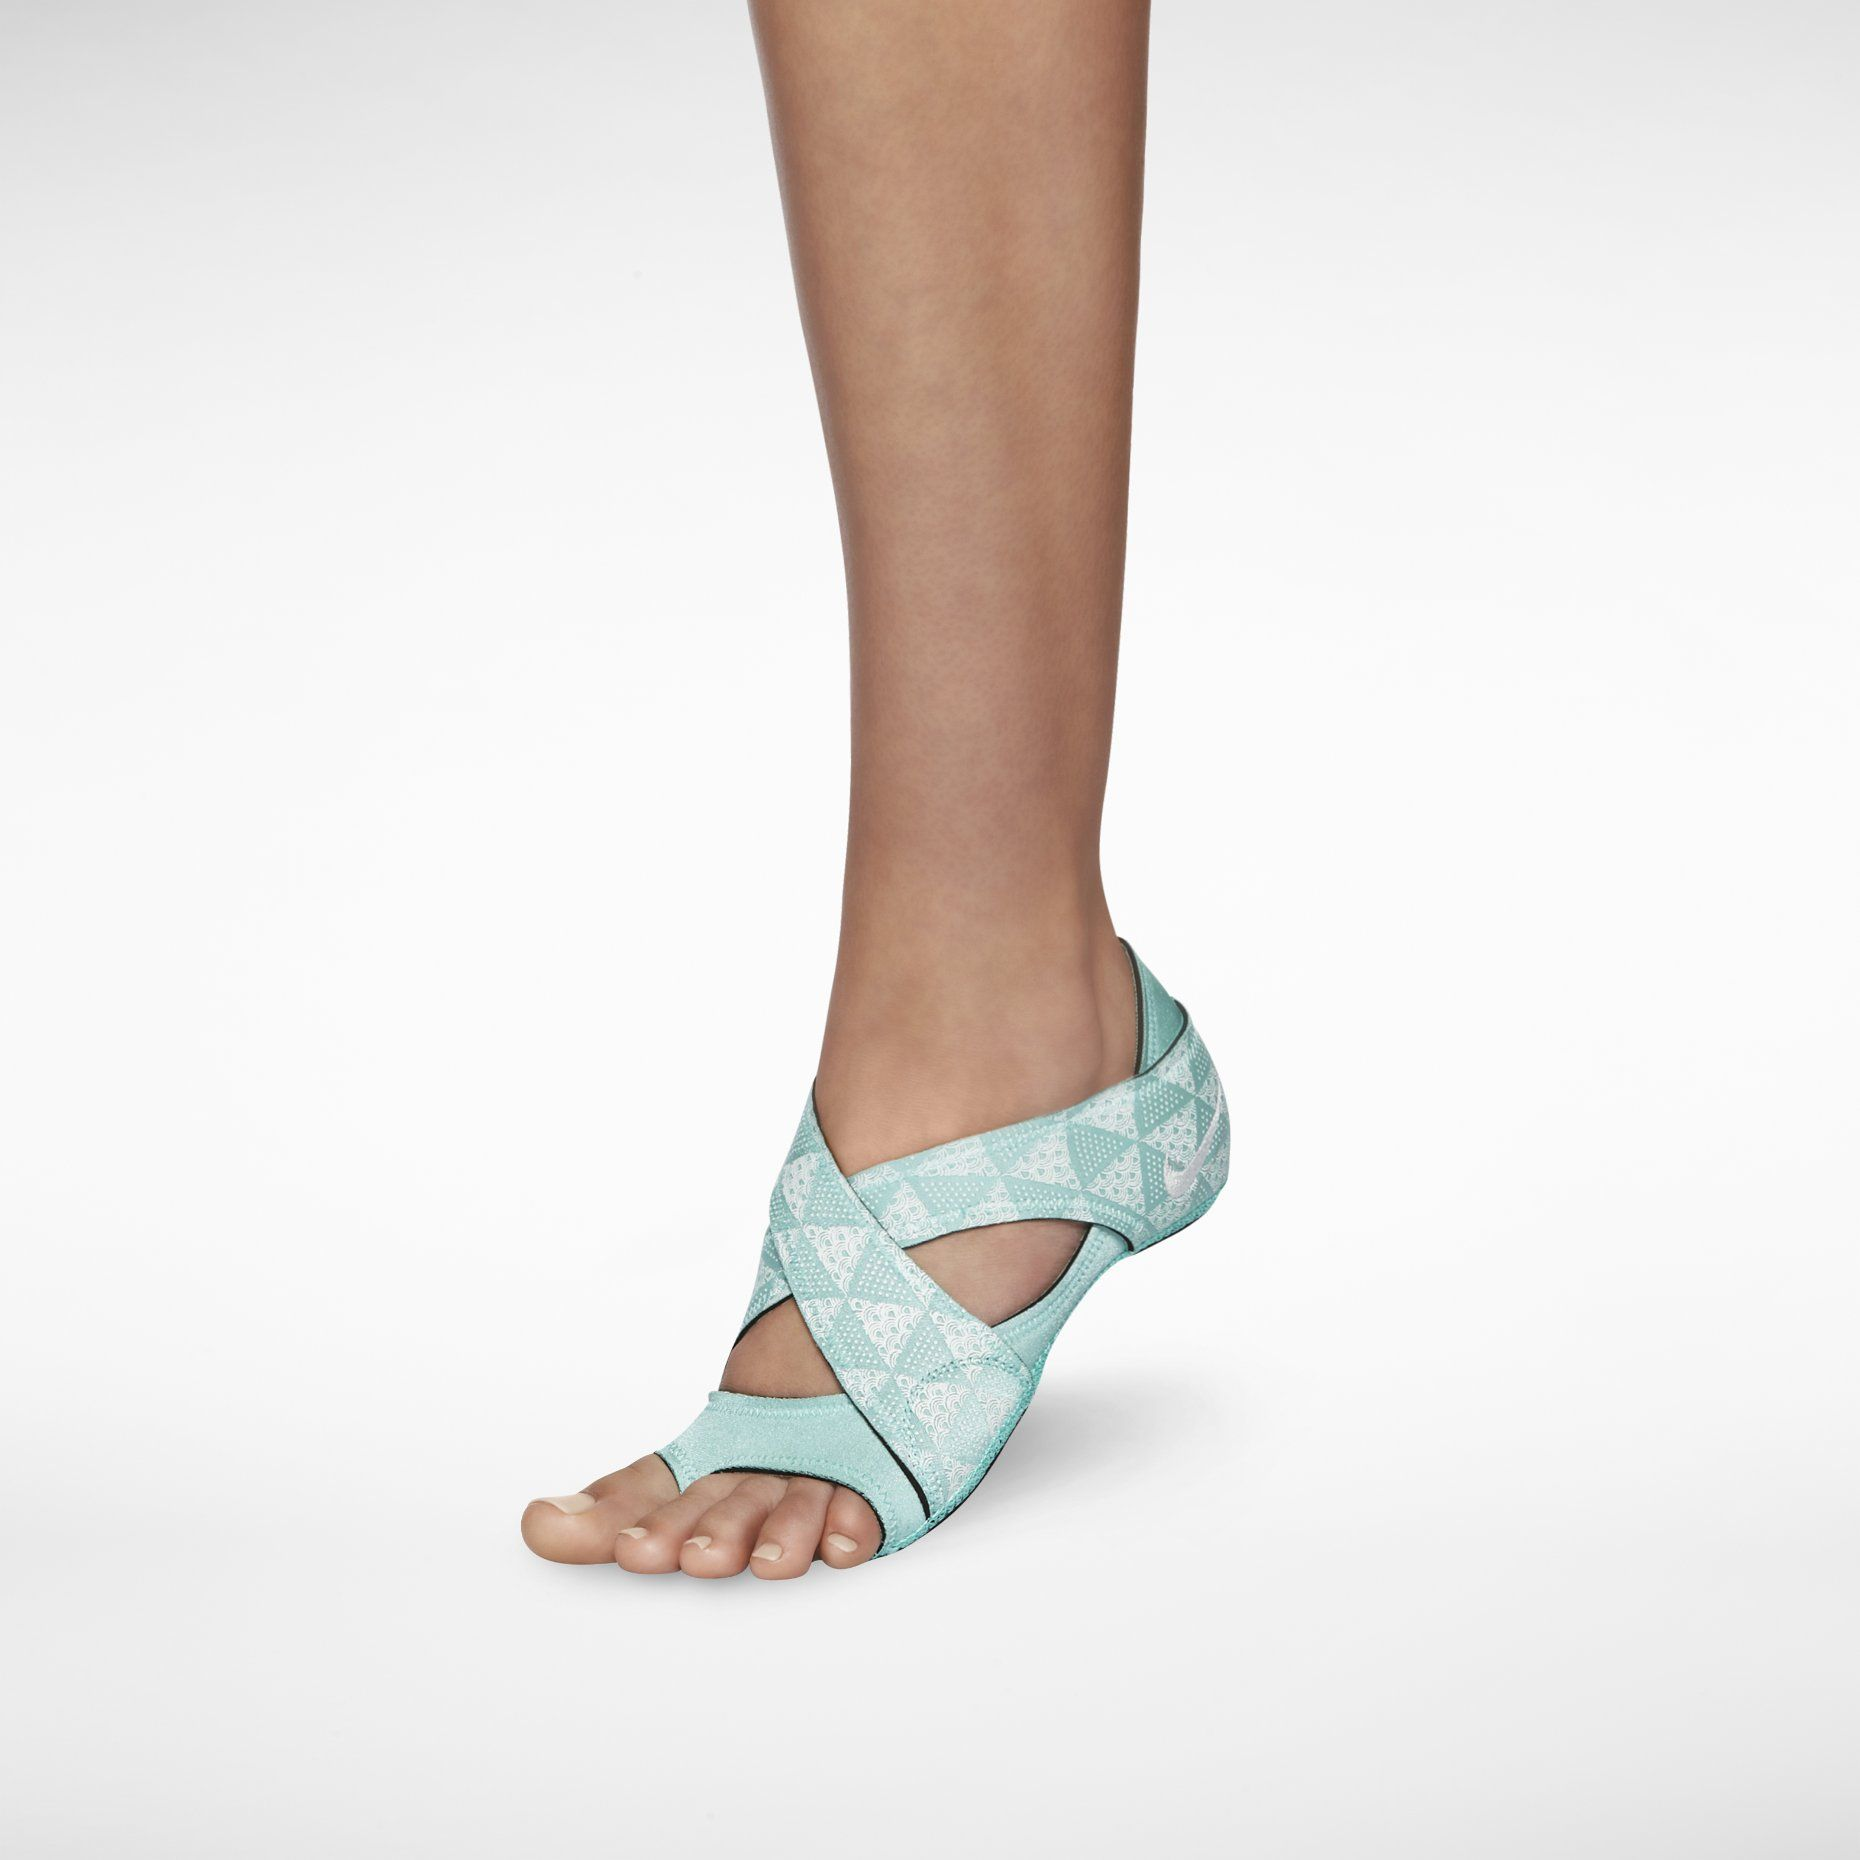 88c7b60e8ba Nike Women s Yoga Socks